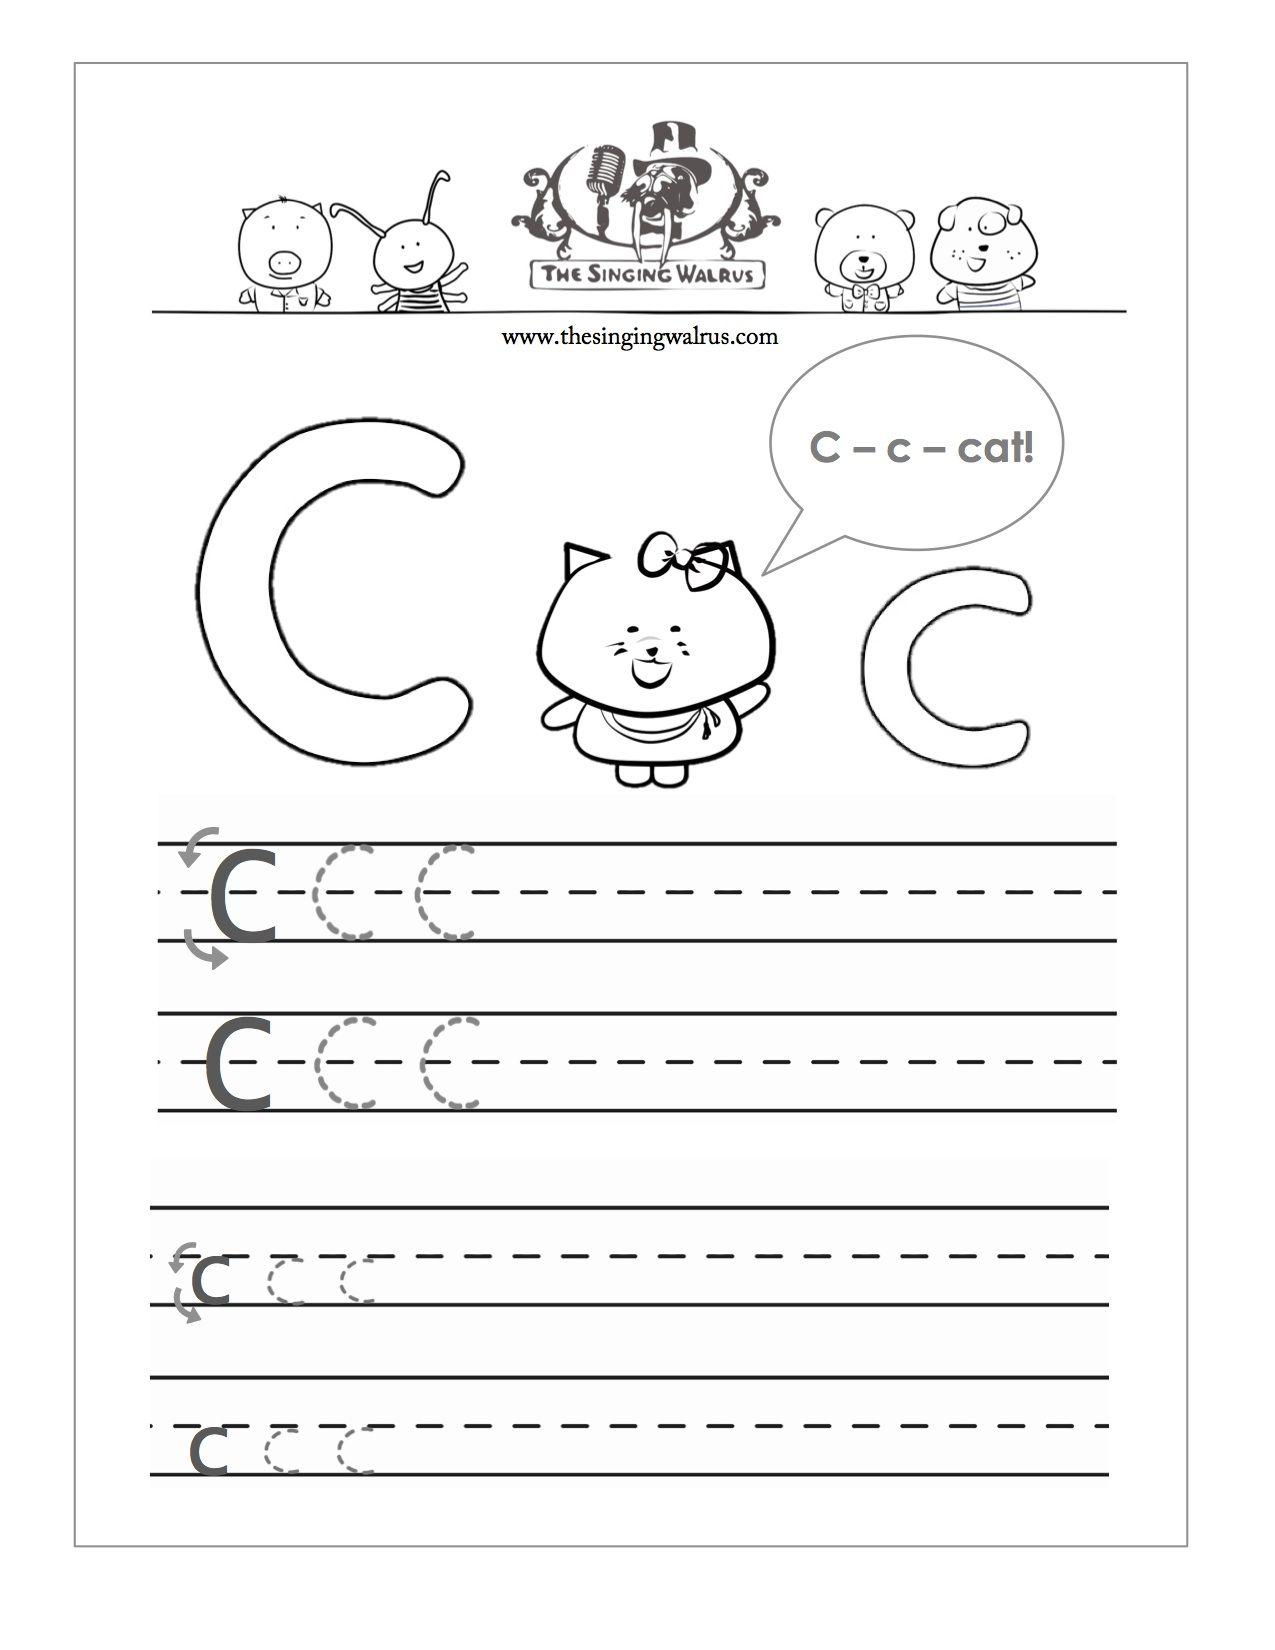 Letter C Worksheets Free Handwriting Worksheets Preschool Letters [ 1650 x 1275 Pixel ]